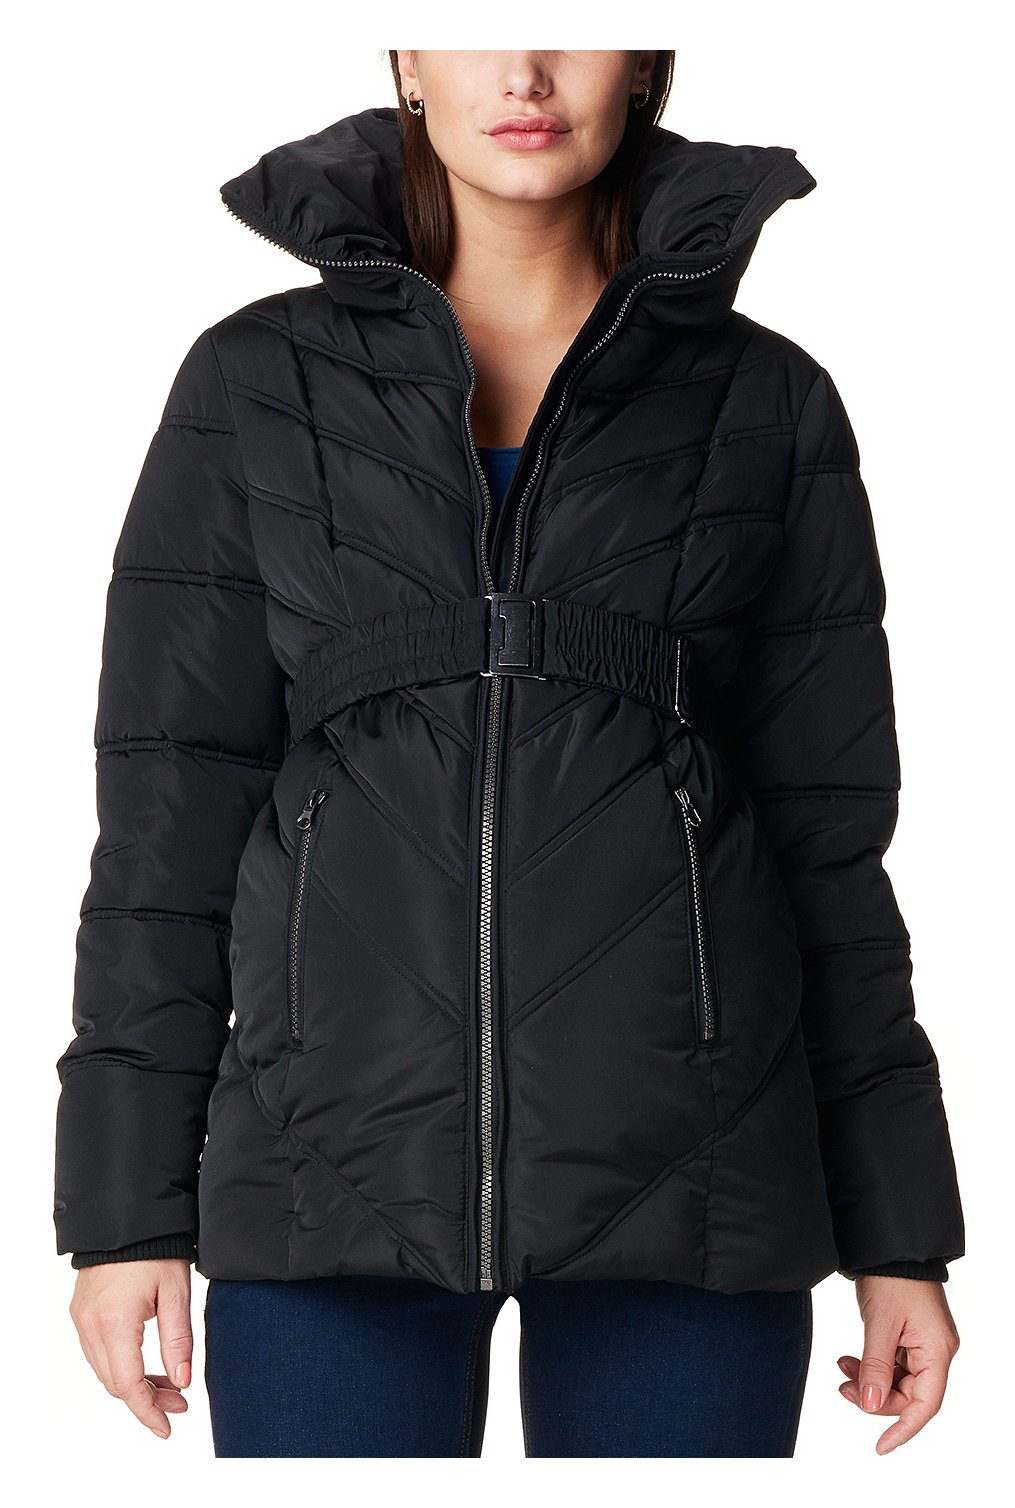 Noppies Women's Maternity Jacket Lene, Black, L by Noppies